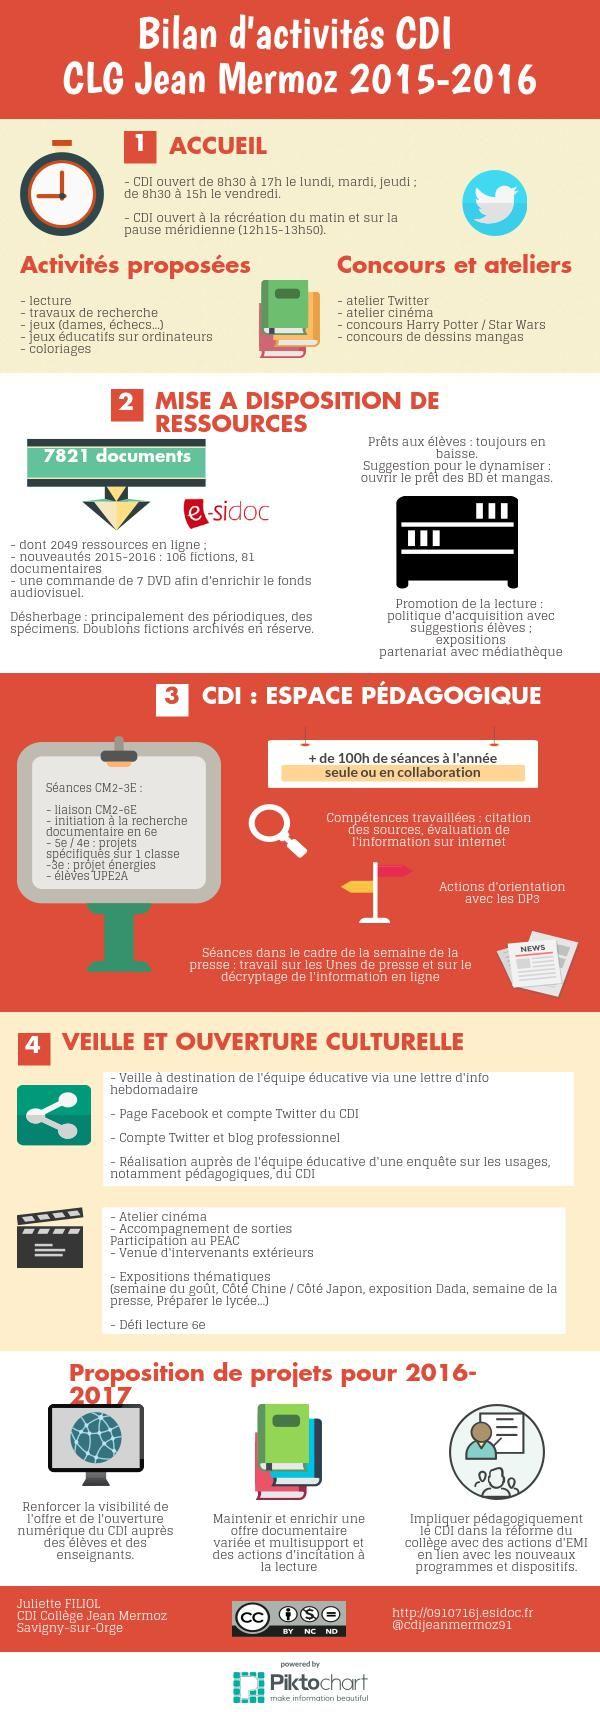 Bilan d'activités 2015-2016   Piktochart Infographic Editor